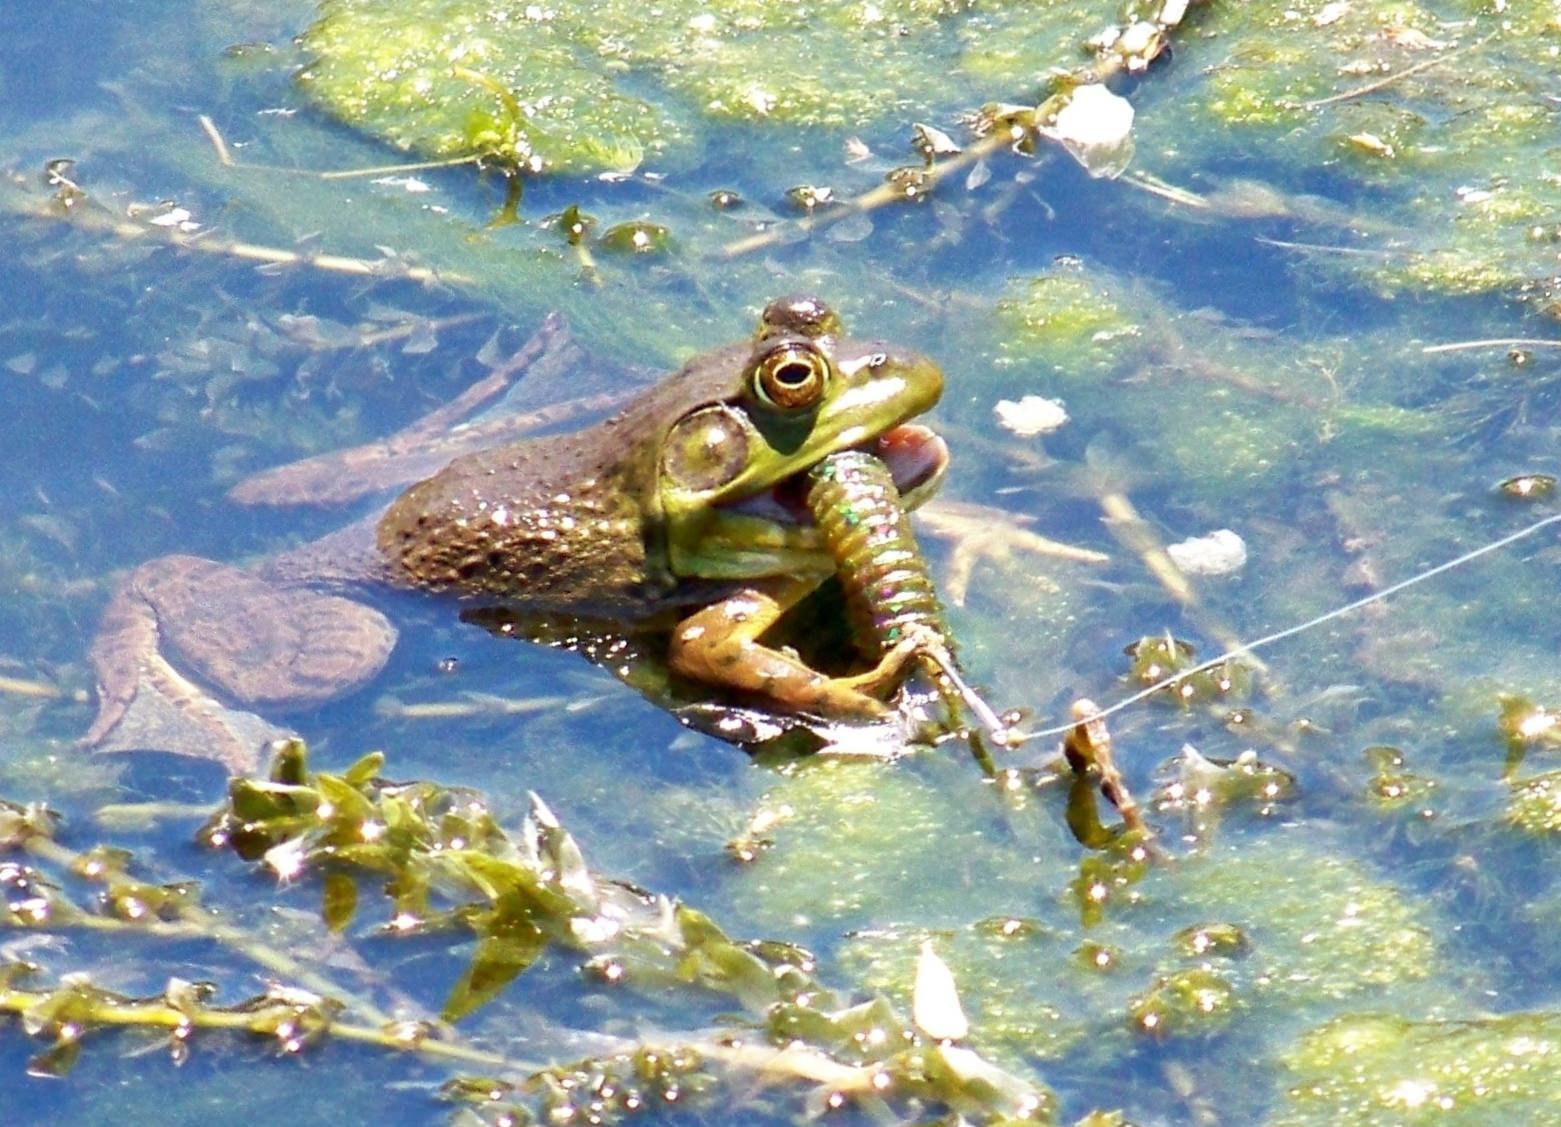 Frog water Italian Slough